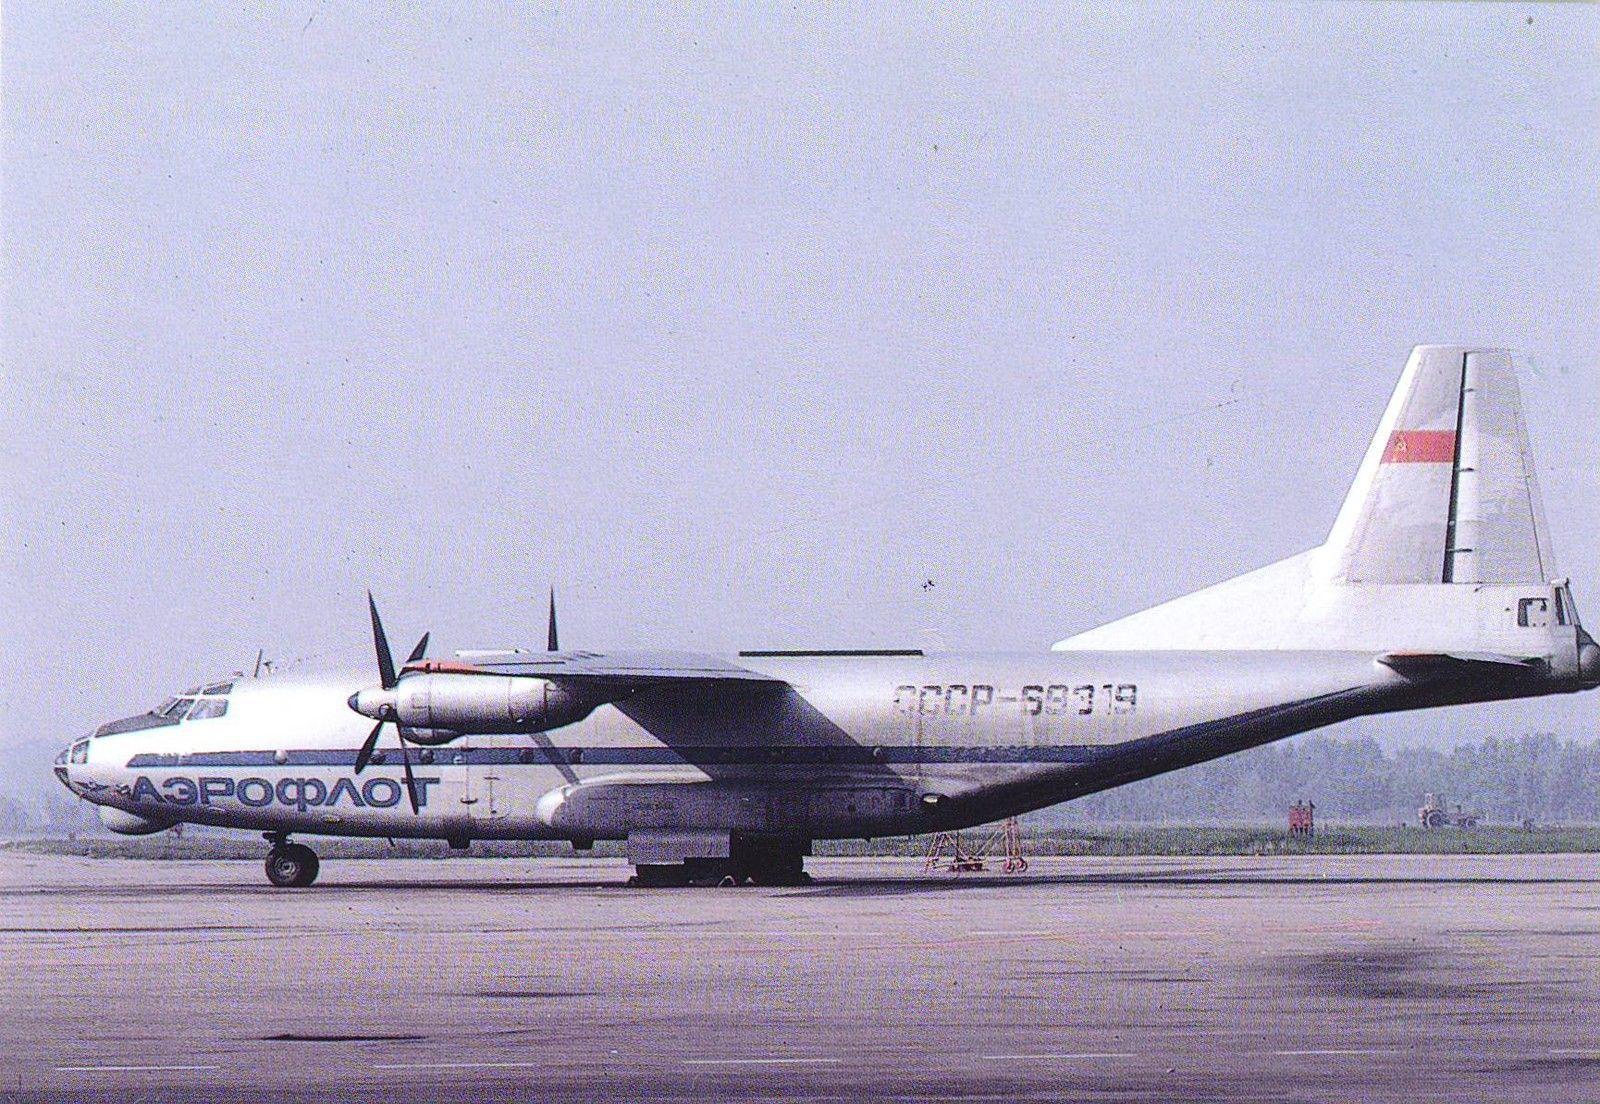 An-8 CCCP-69319.jpg